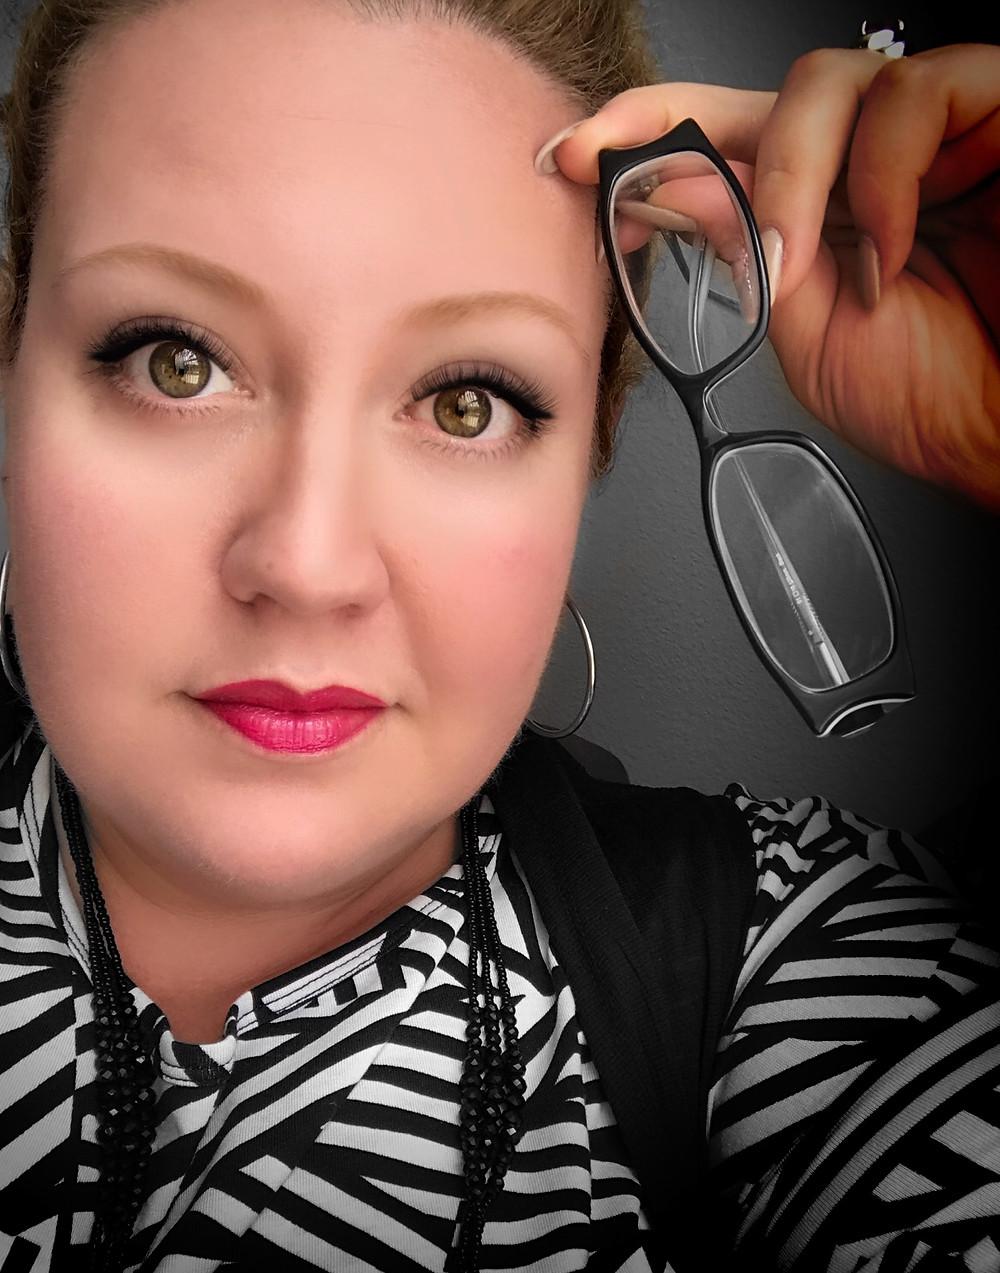 Do I look smarter holding my glasses?